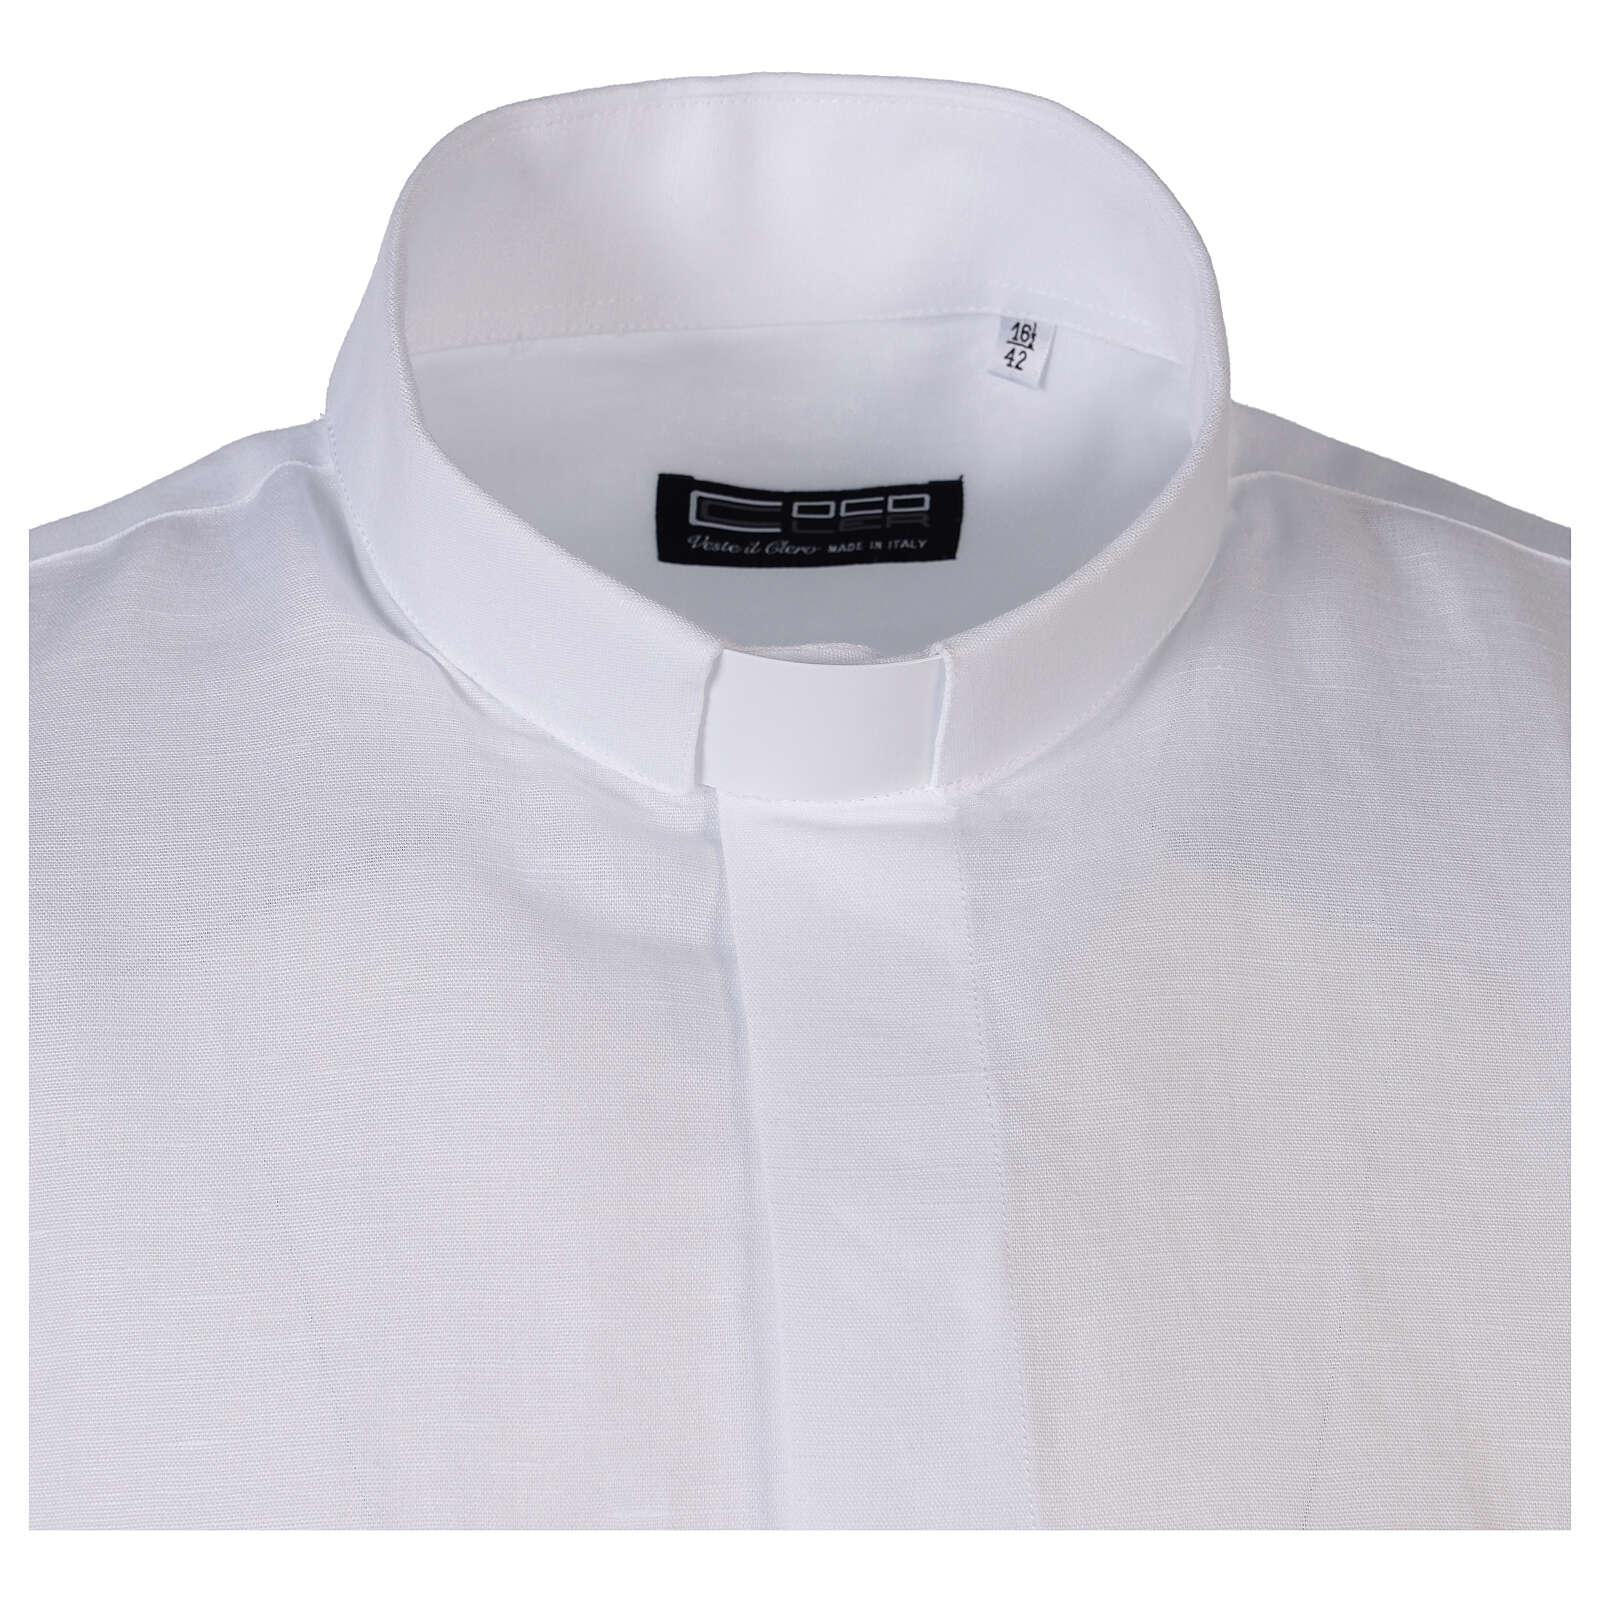 Camisa cuello clergy de hilo media manga blanco 4